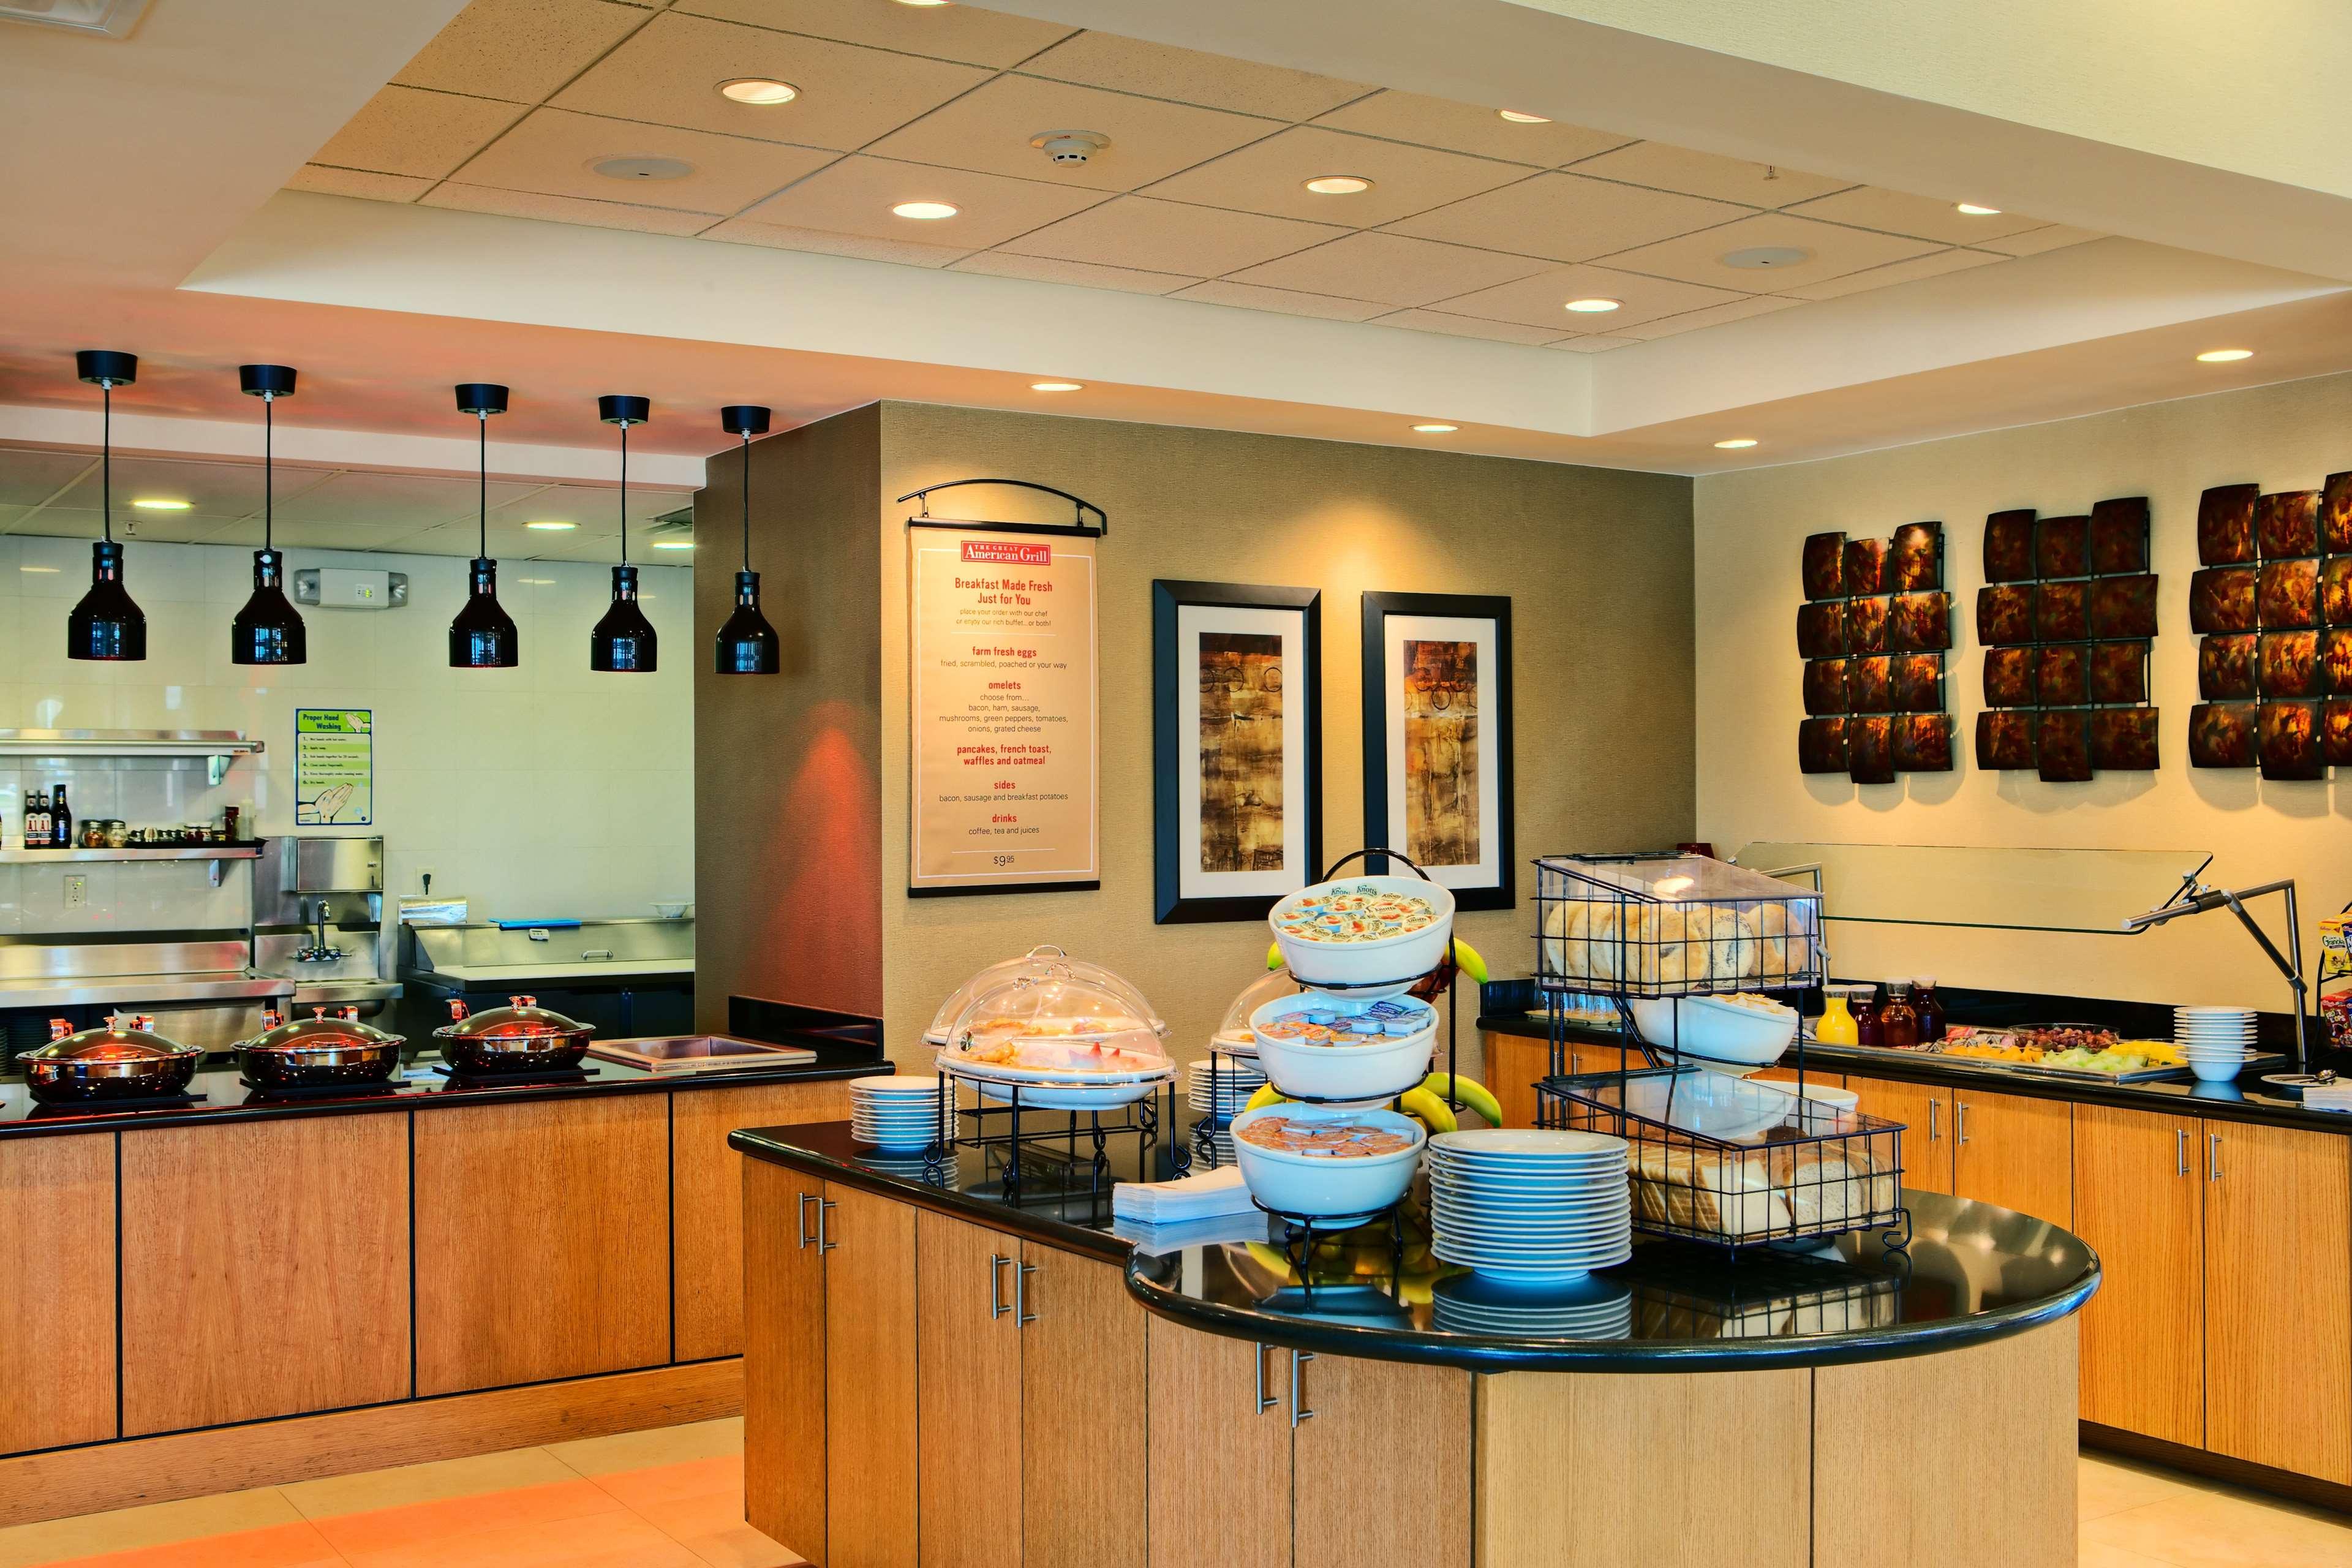 Hilton Garden Inn DFW North Grapevine image 13